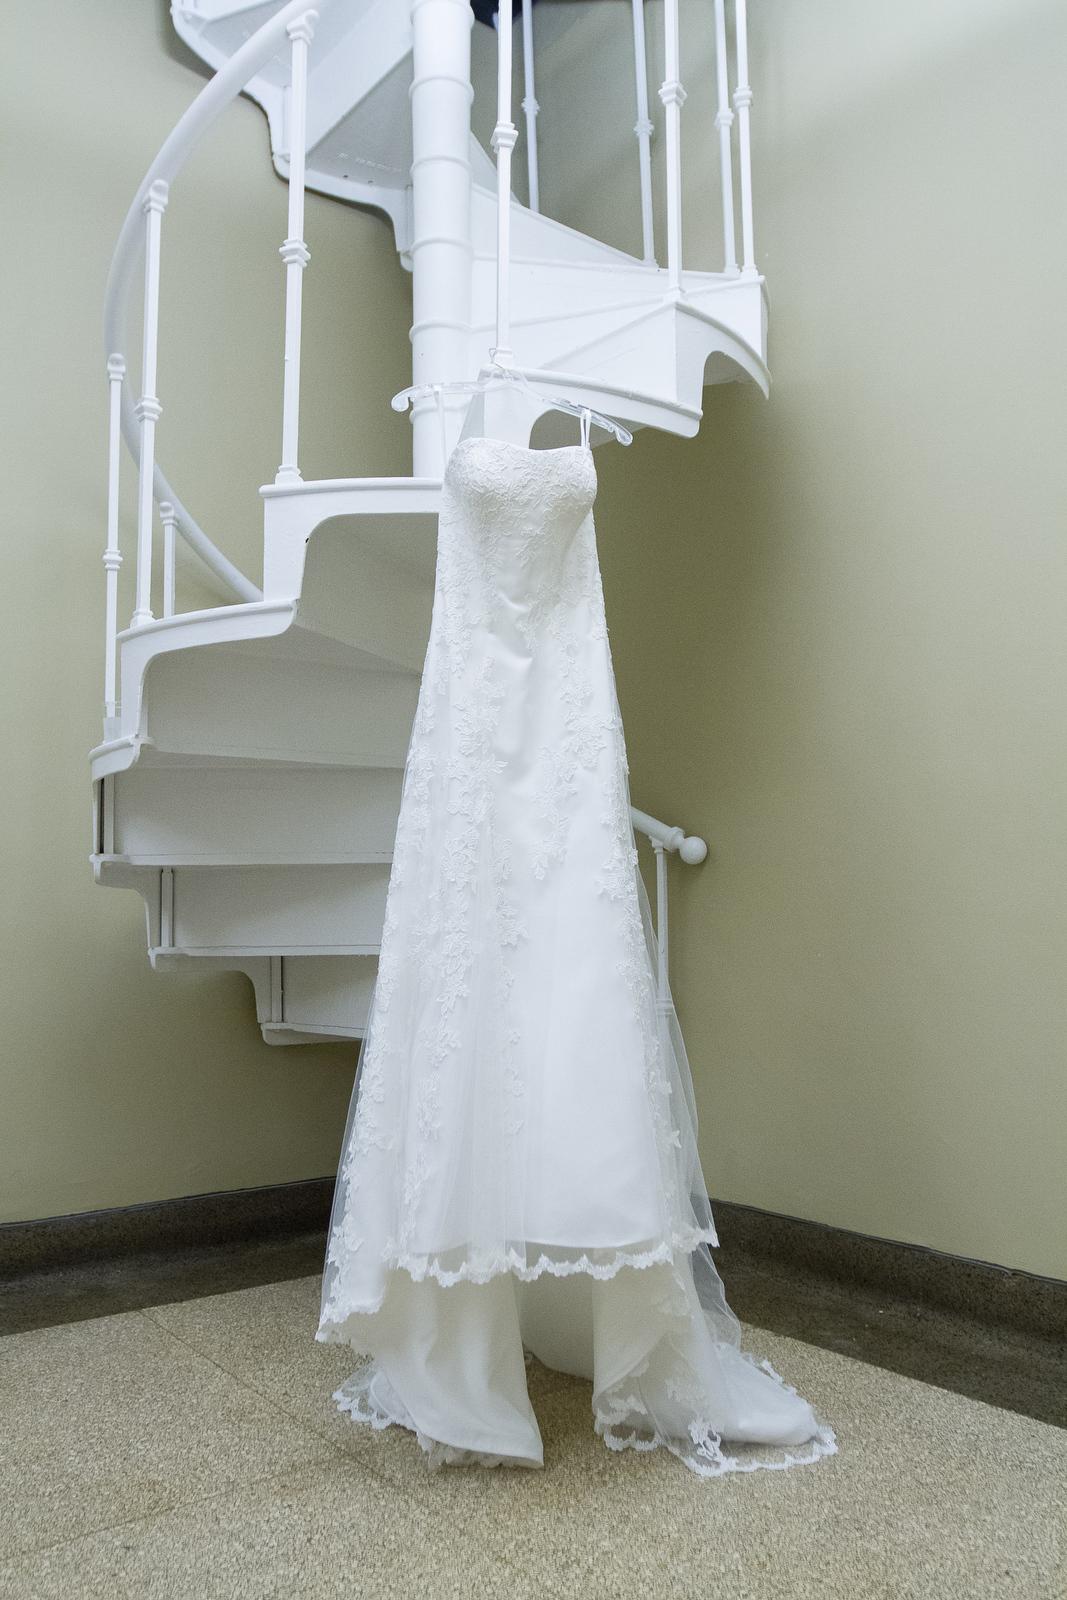 01_Wedding_Prep_003.JPG